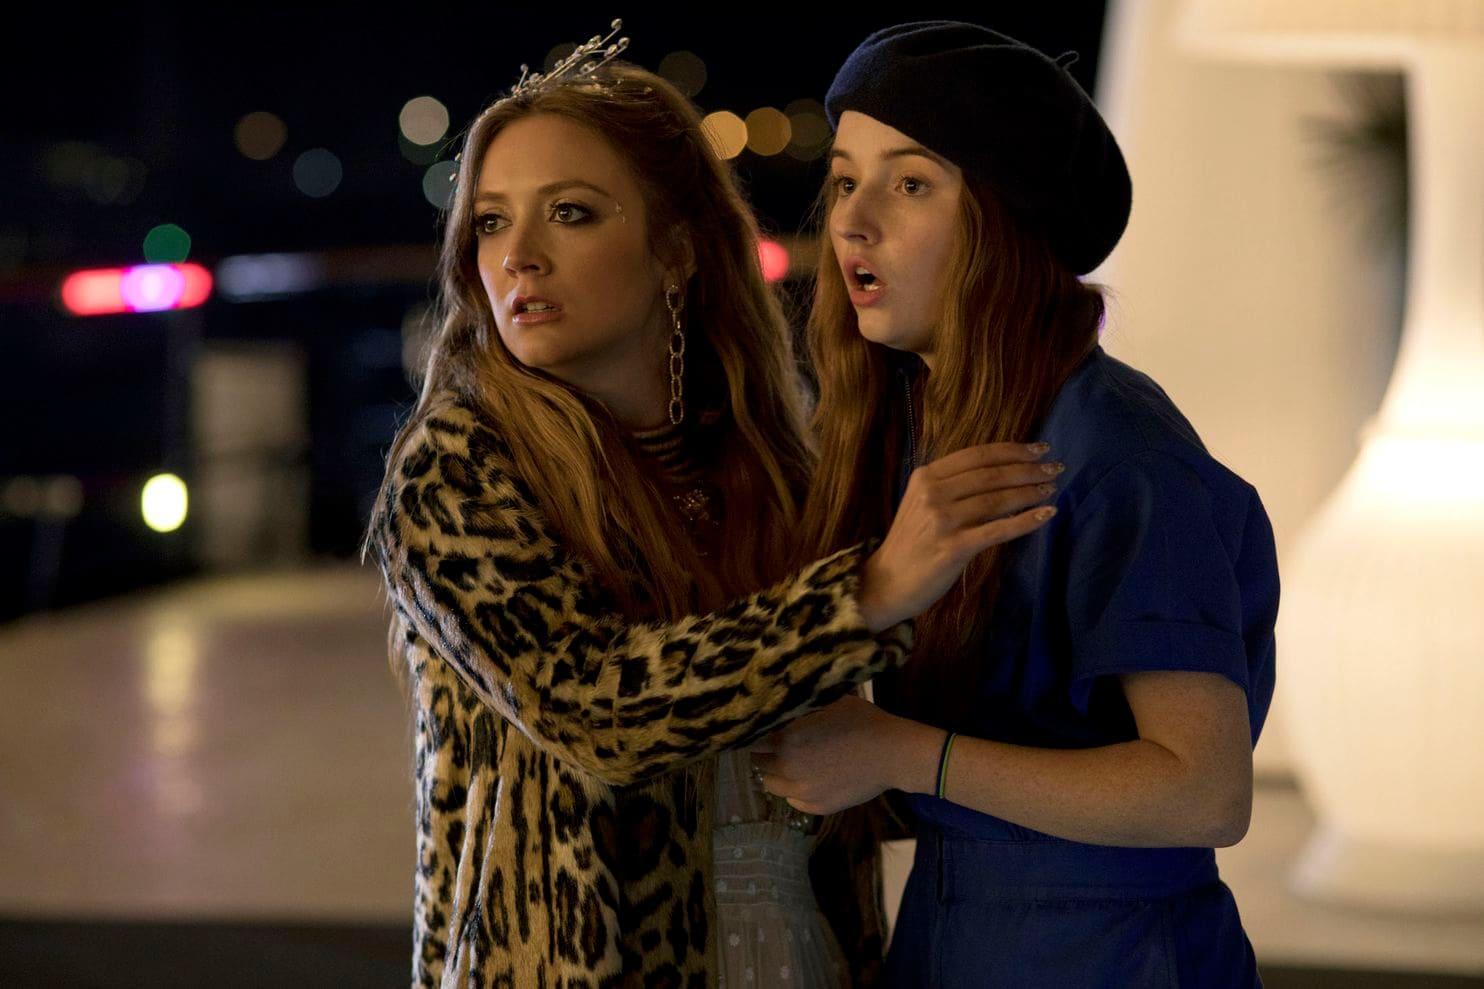 Billie Lourde & Kaitlyn Dever